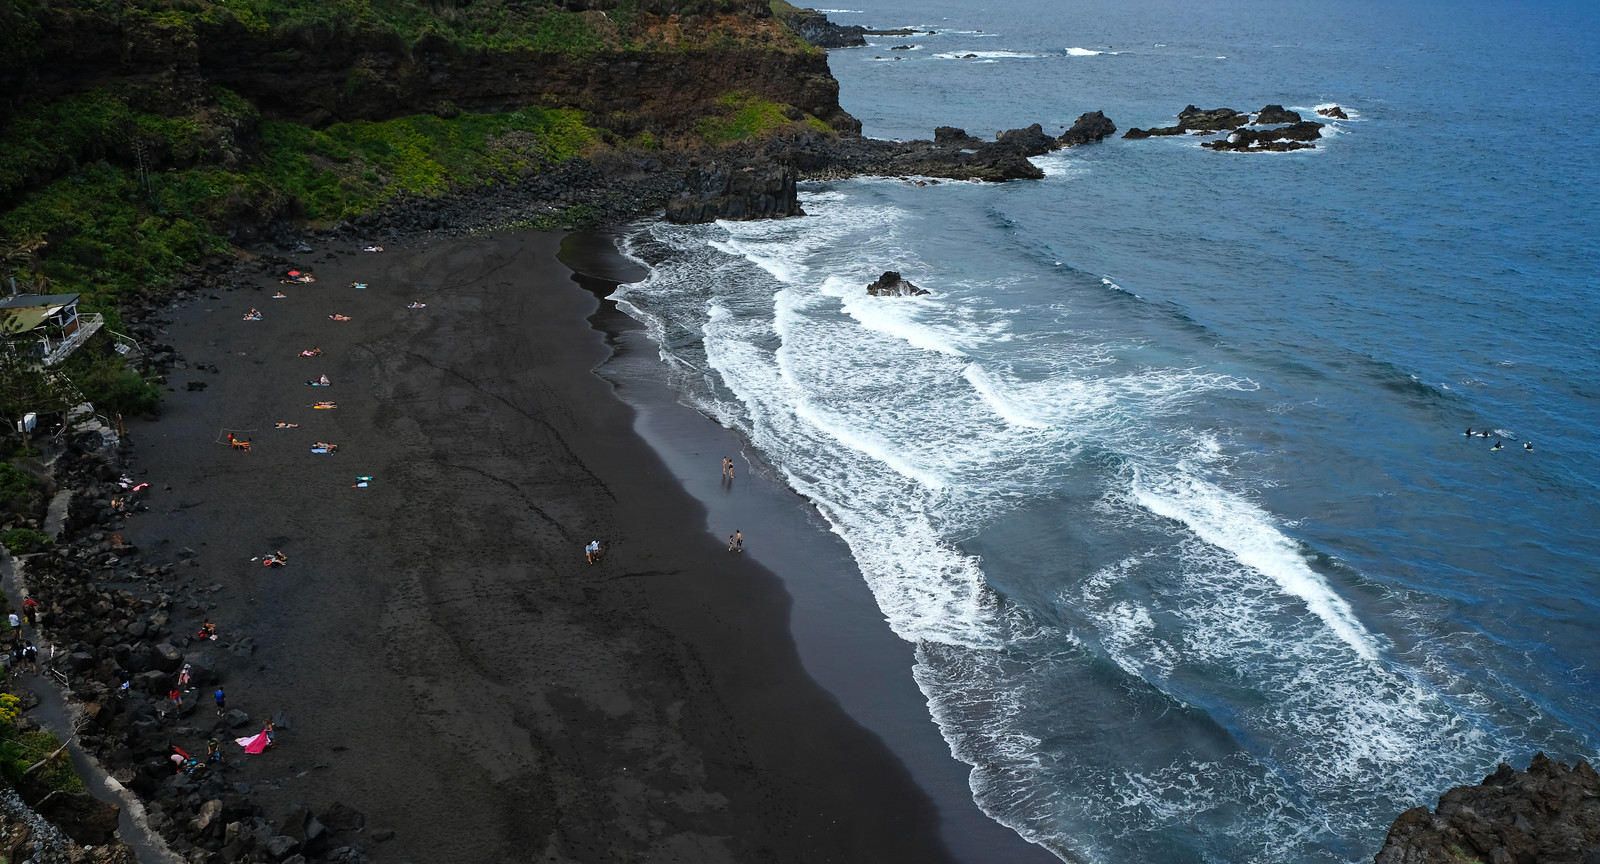 Playa el Bollullo, Tenerife, Canary Islands, Spain